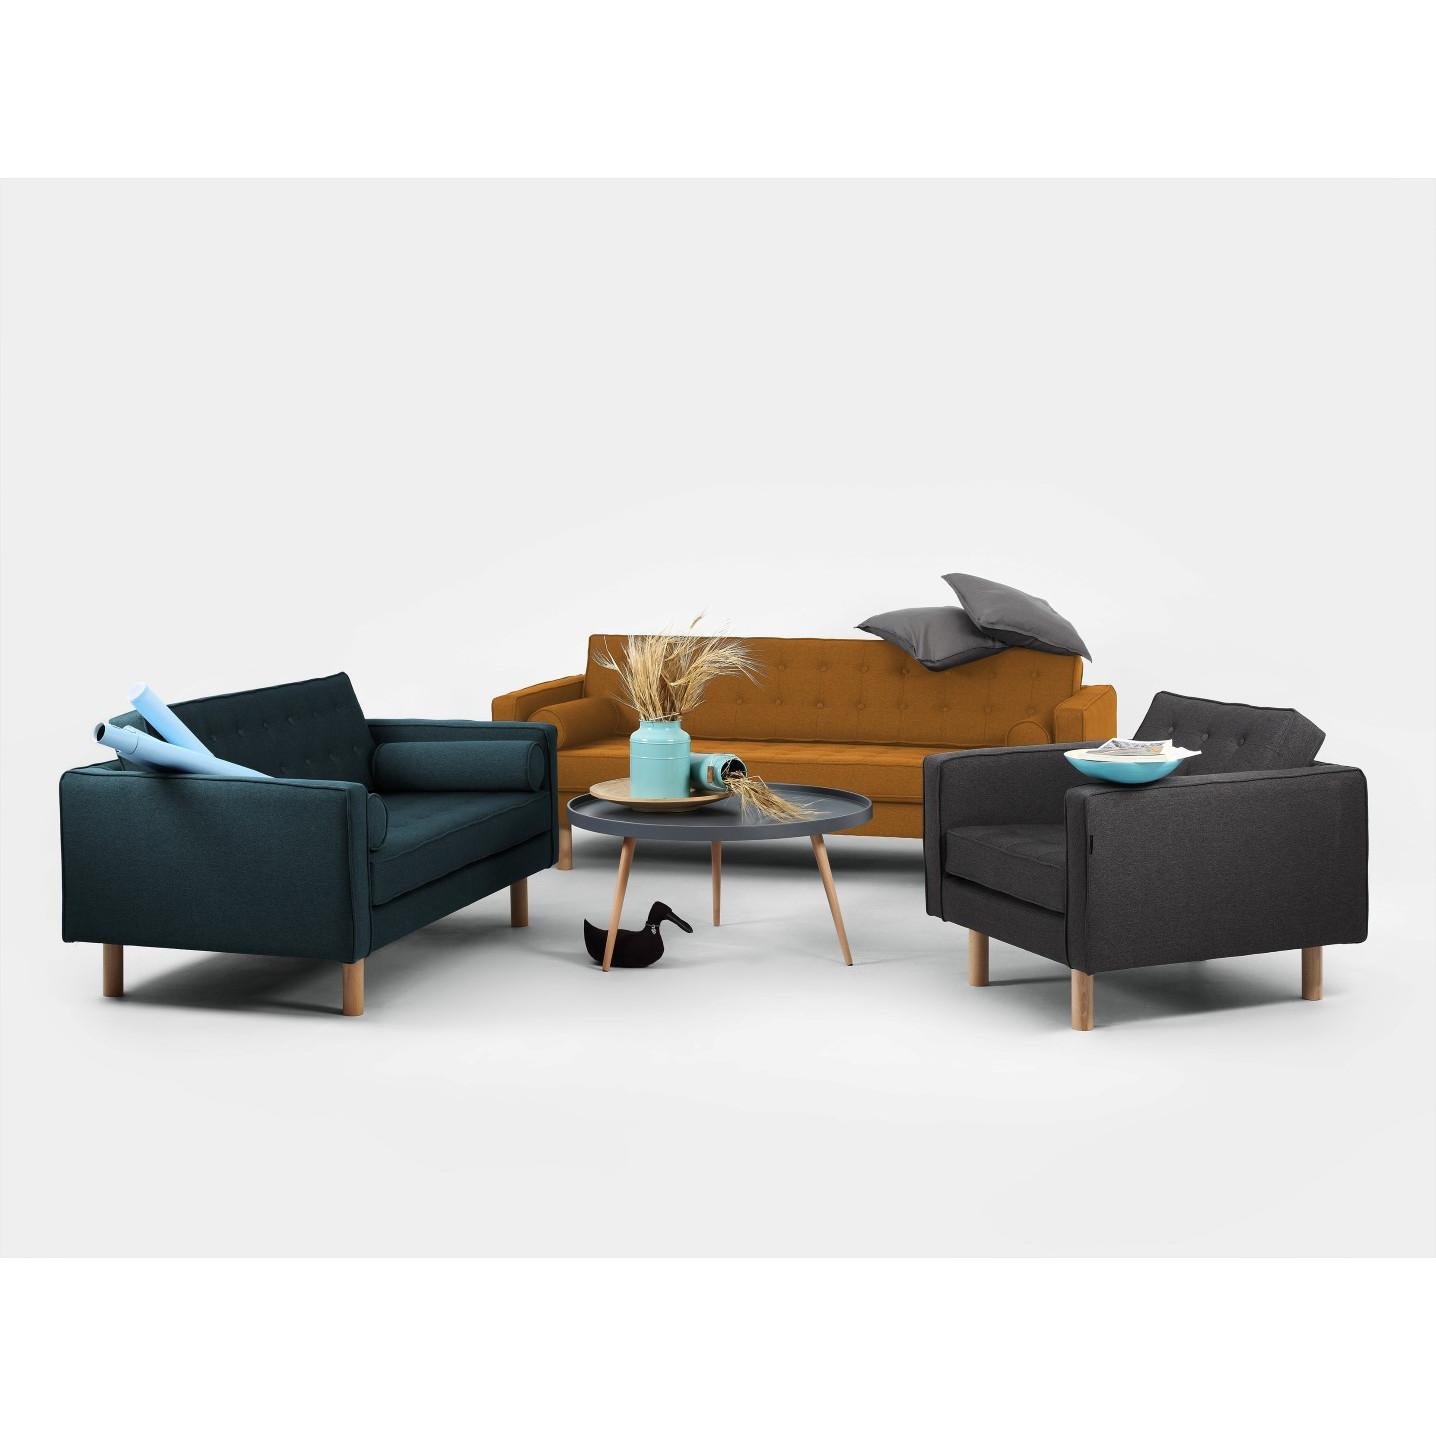 3 Seater Sofa Topic Wood | Honey